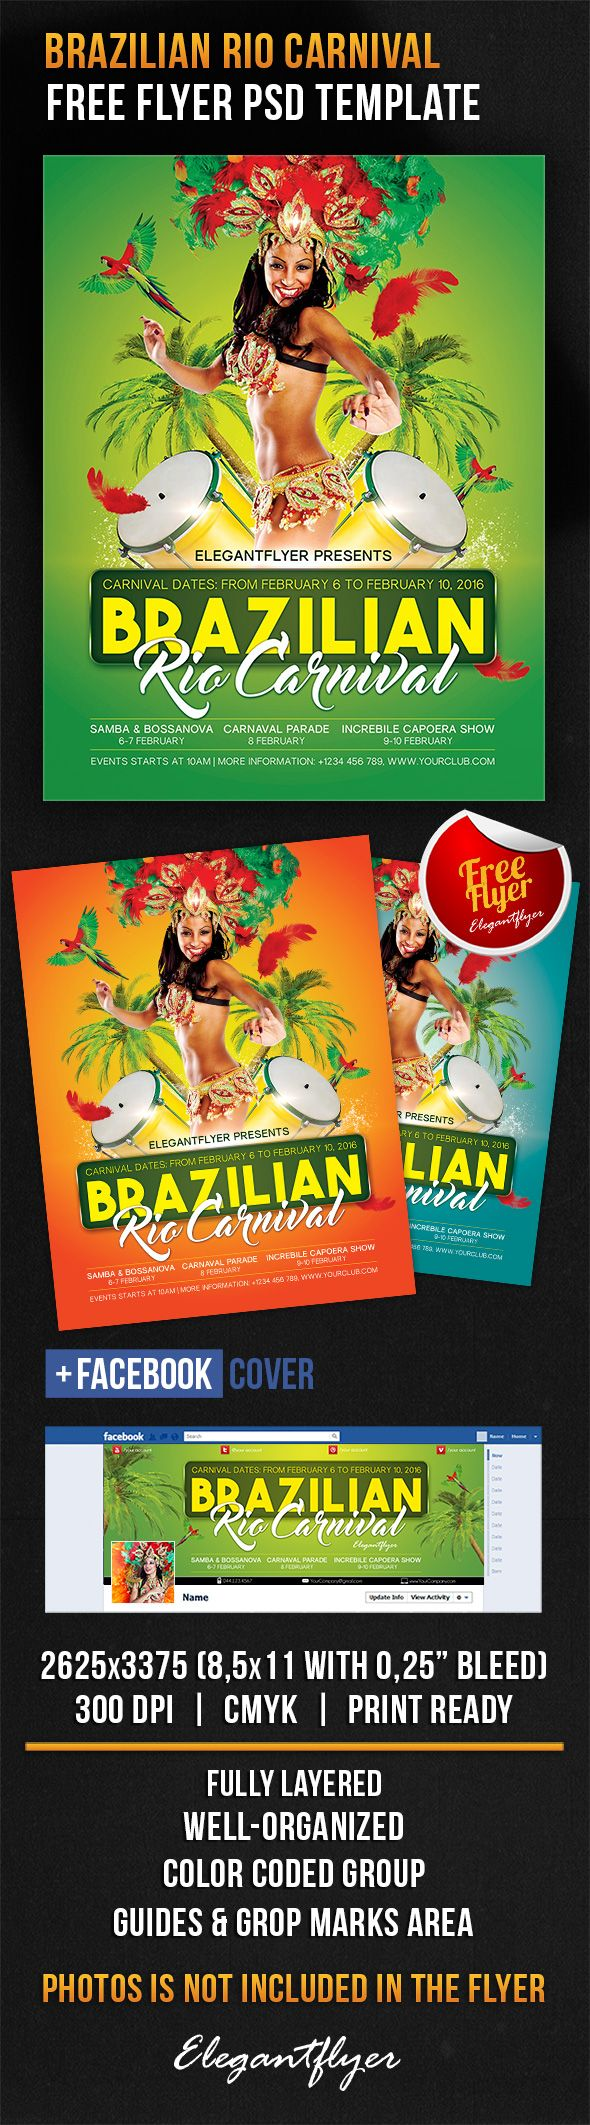 Music Flyer For Brazilian Rio Carnival Rio Pinterest Carnaval